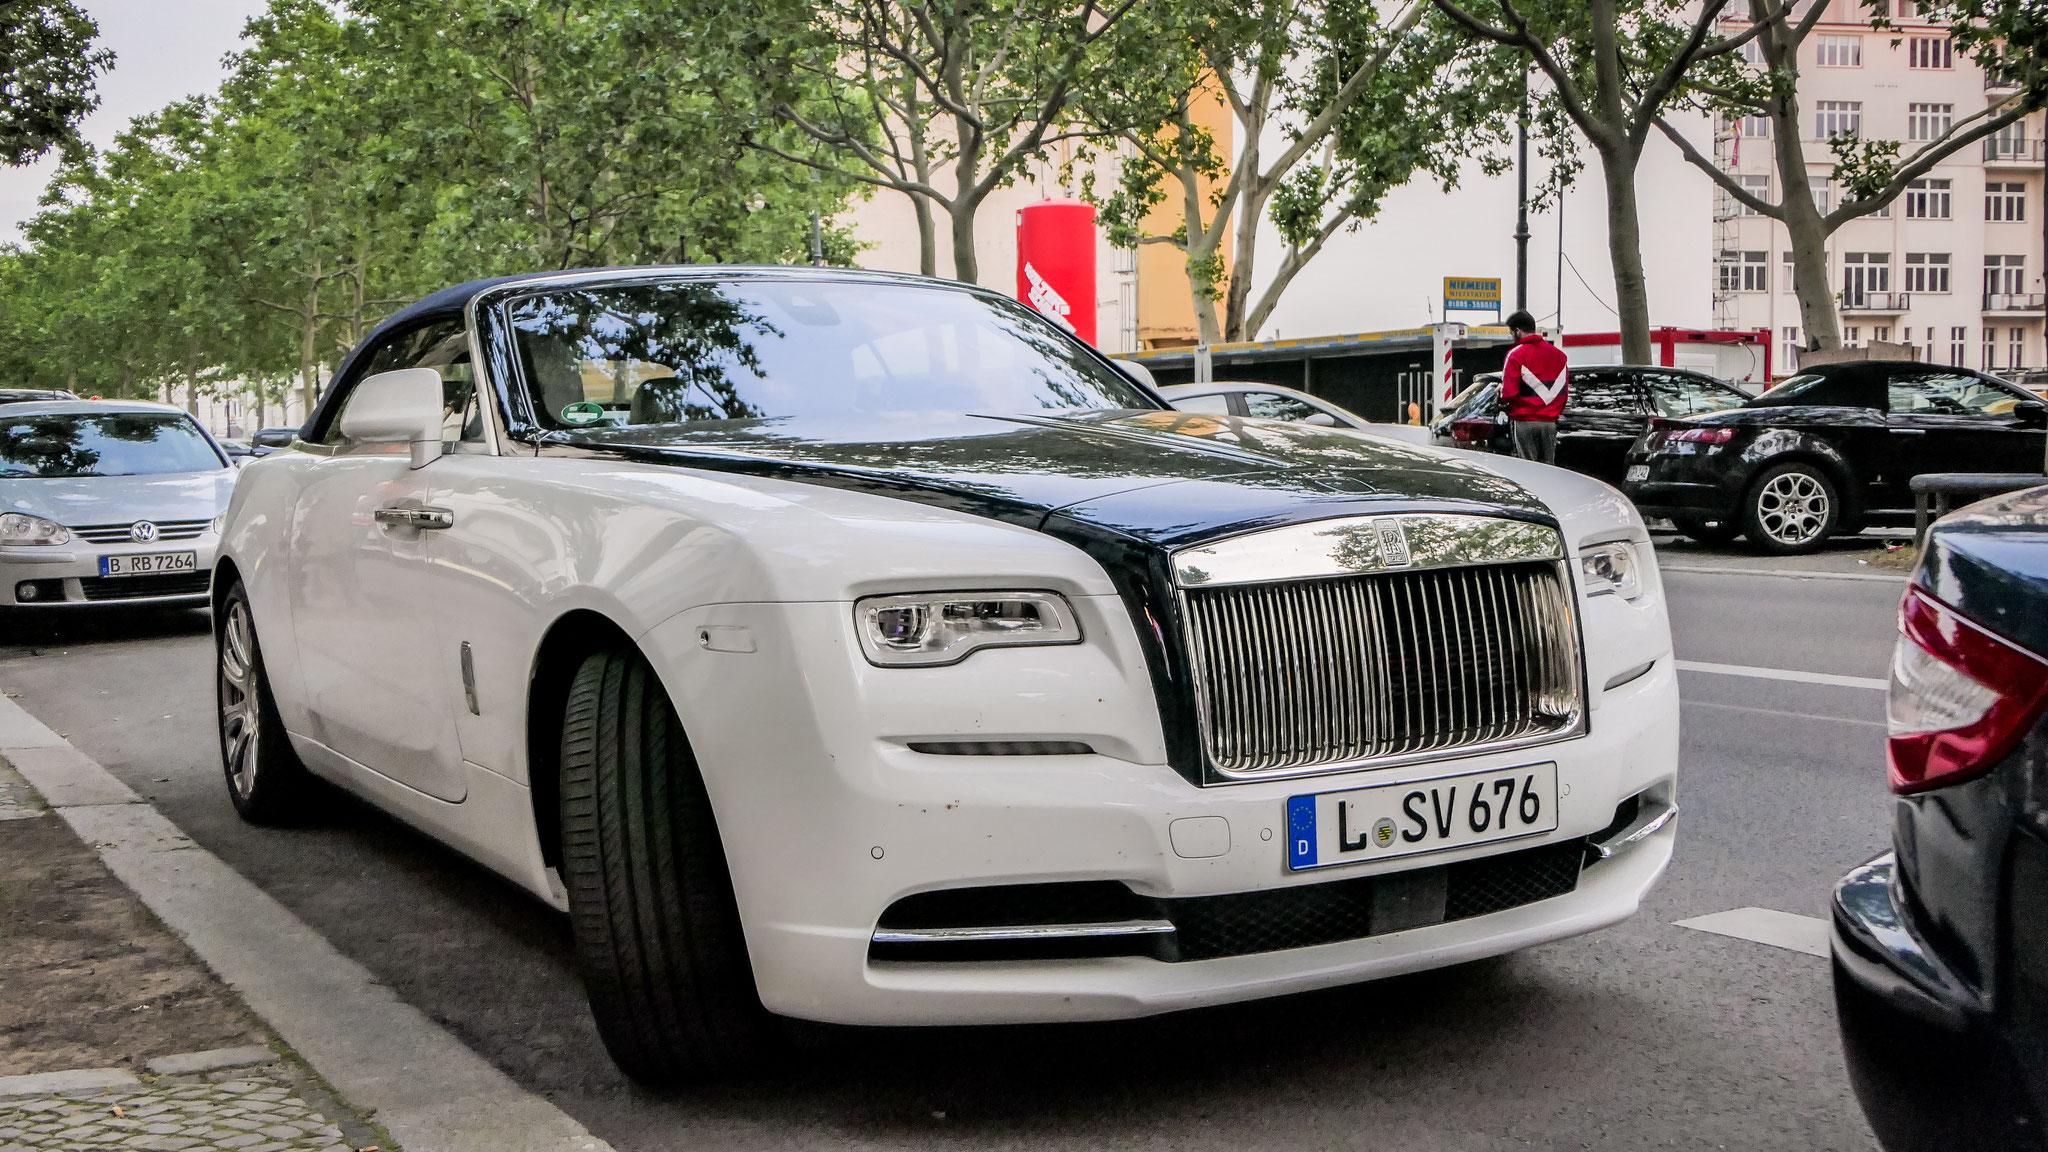 Rolls Royce Dawn - L-SV-676